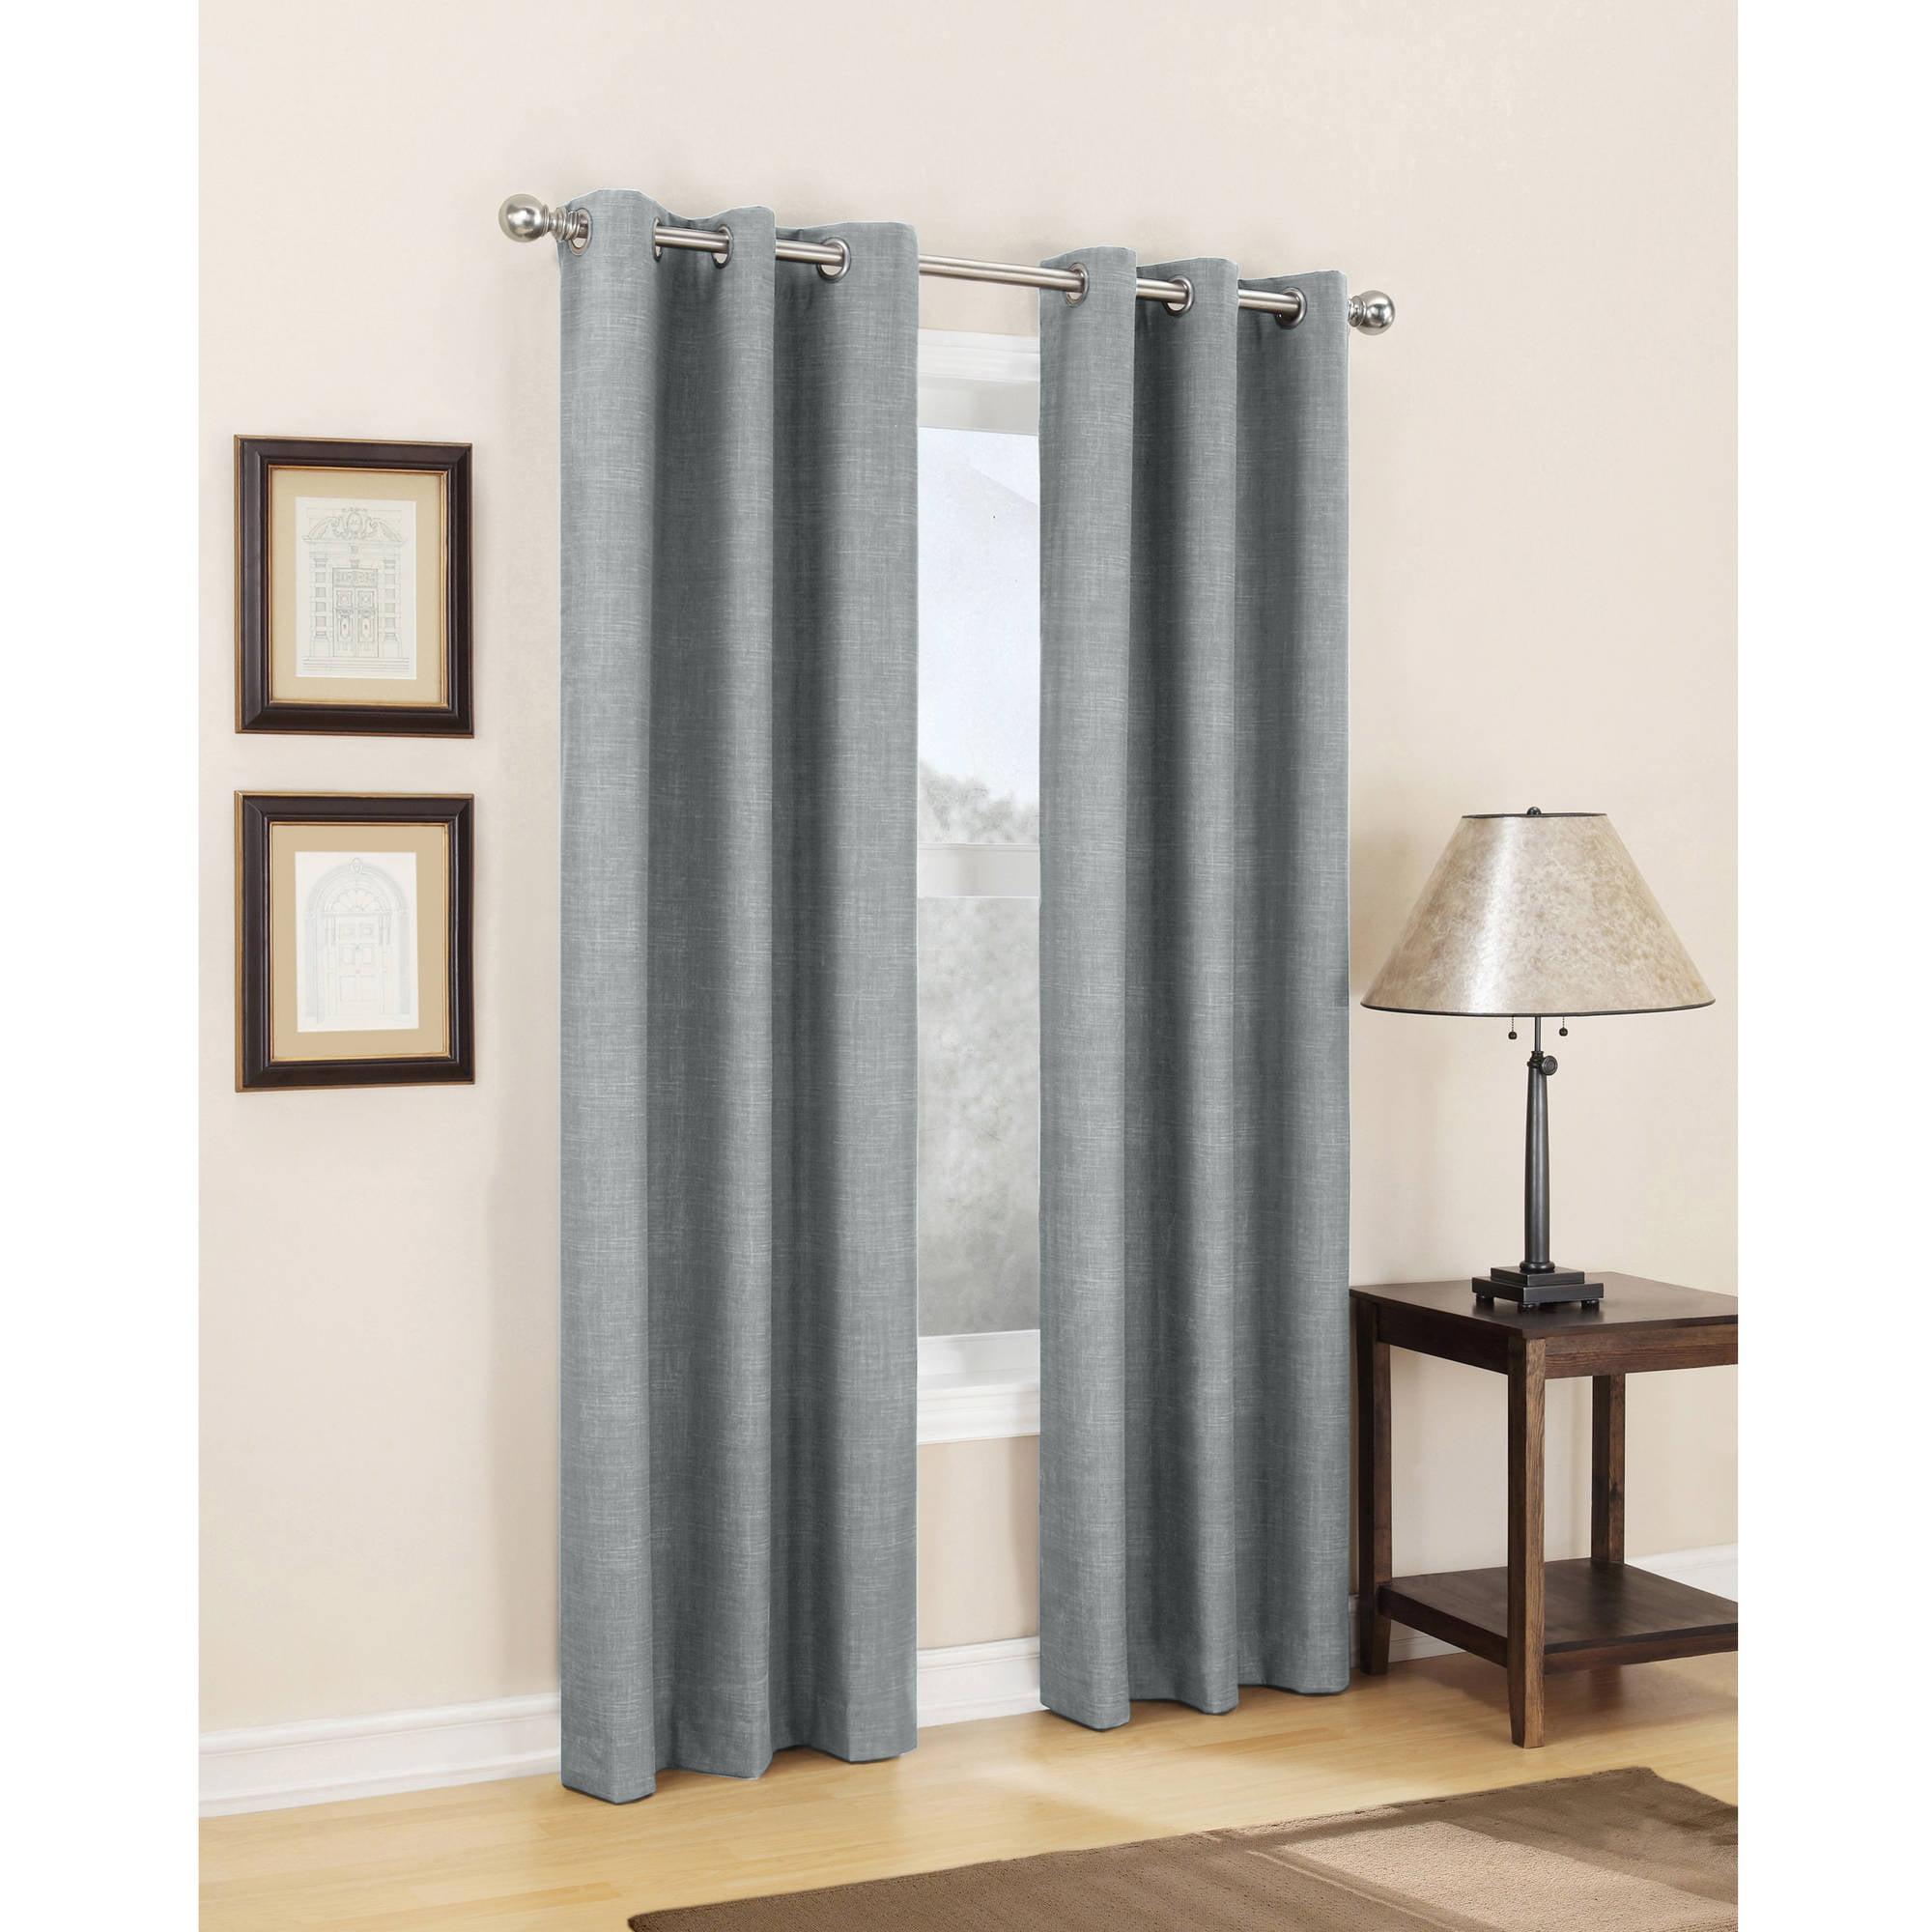 Sun Zero Caleb Thermal Lined Curtain Panel